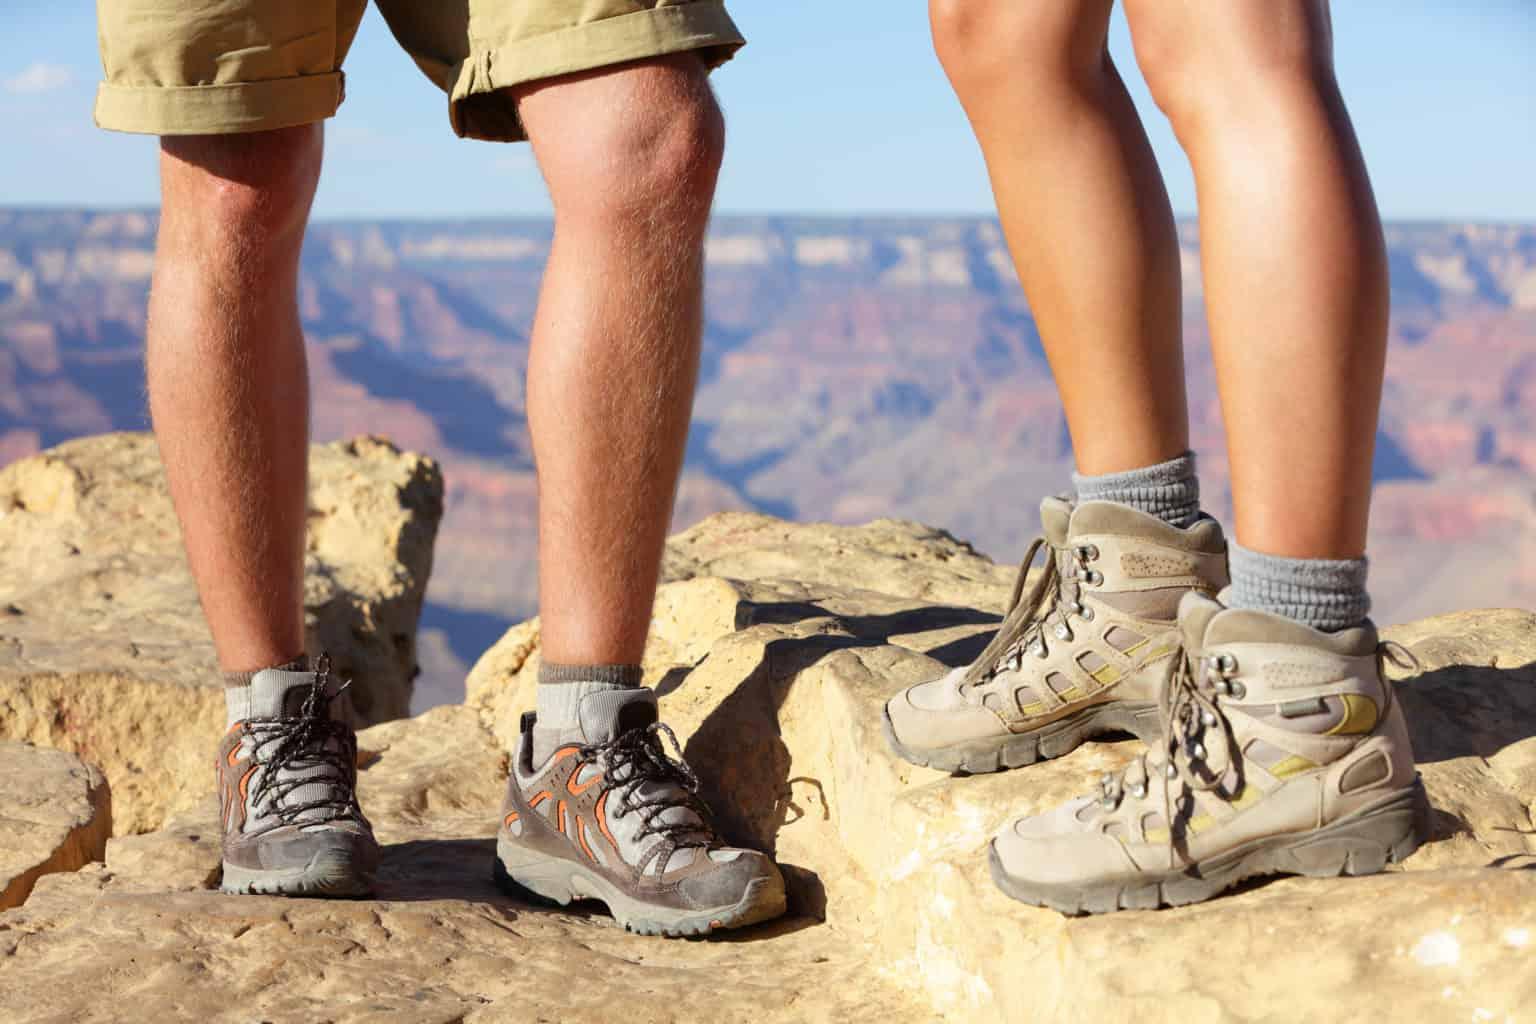 Trail Runners vs Hiking Shoes